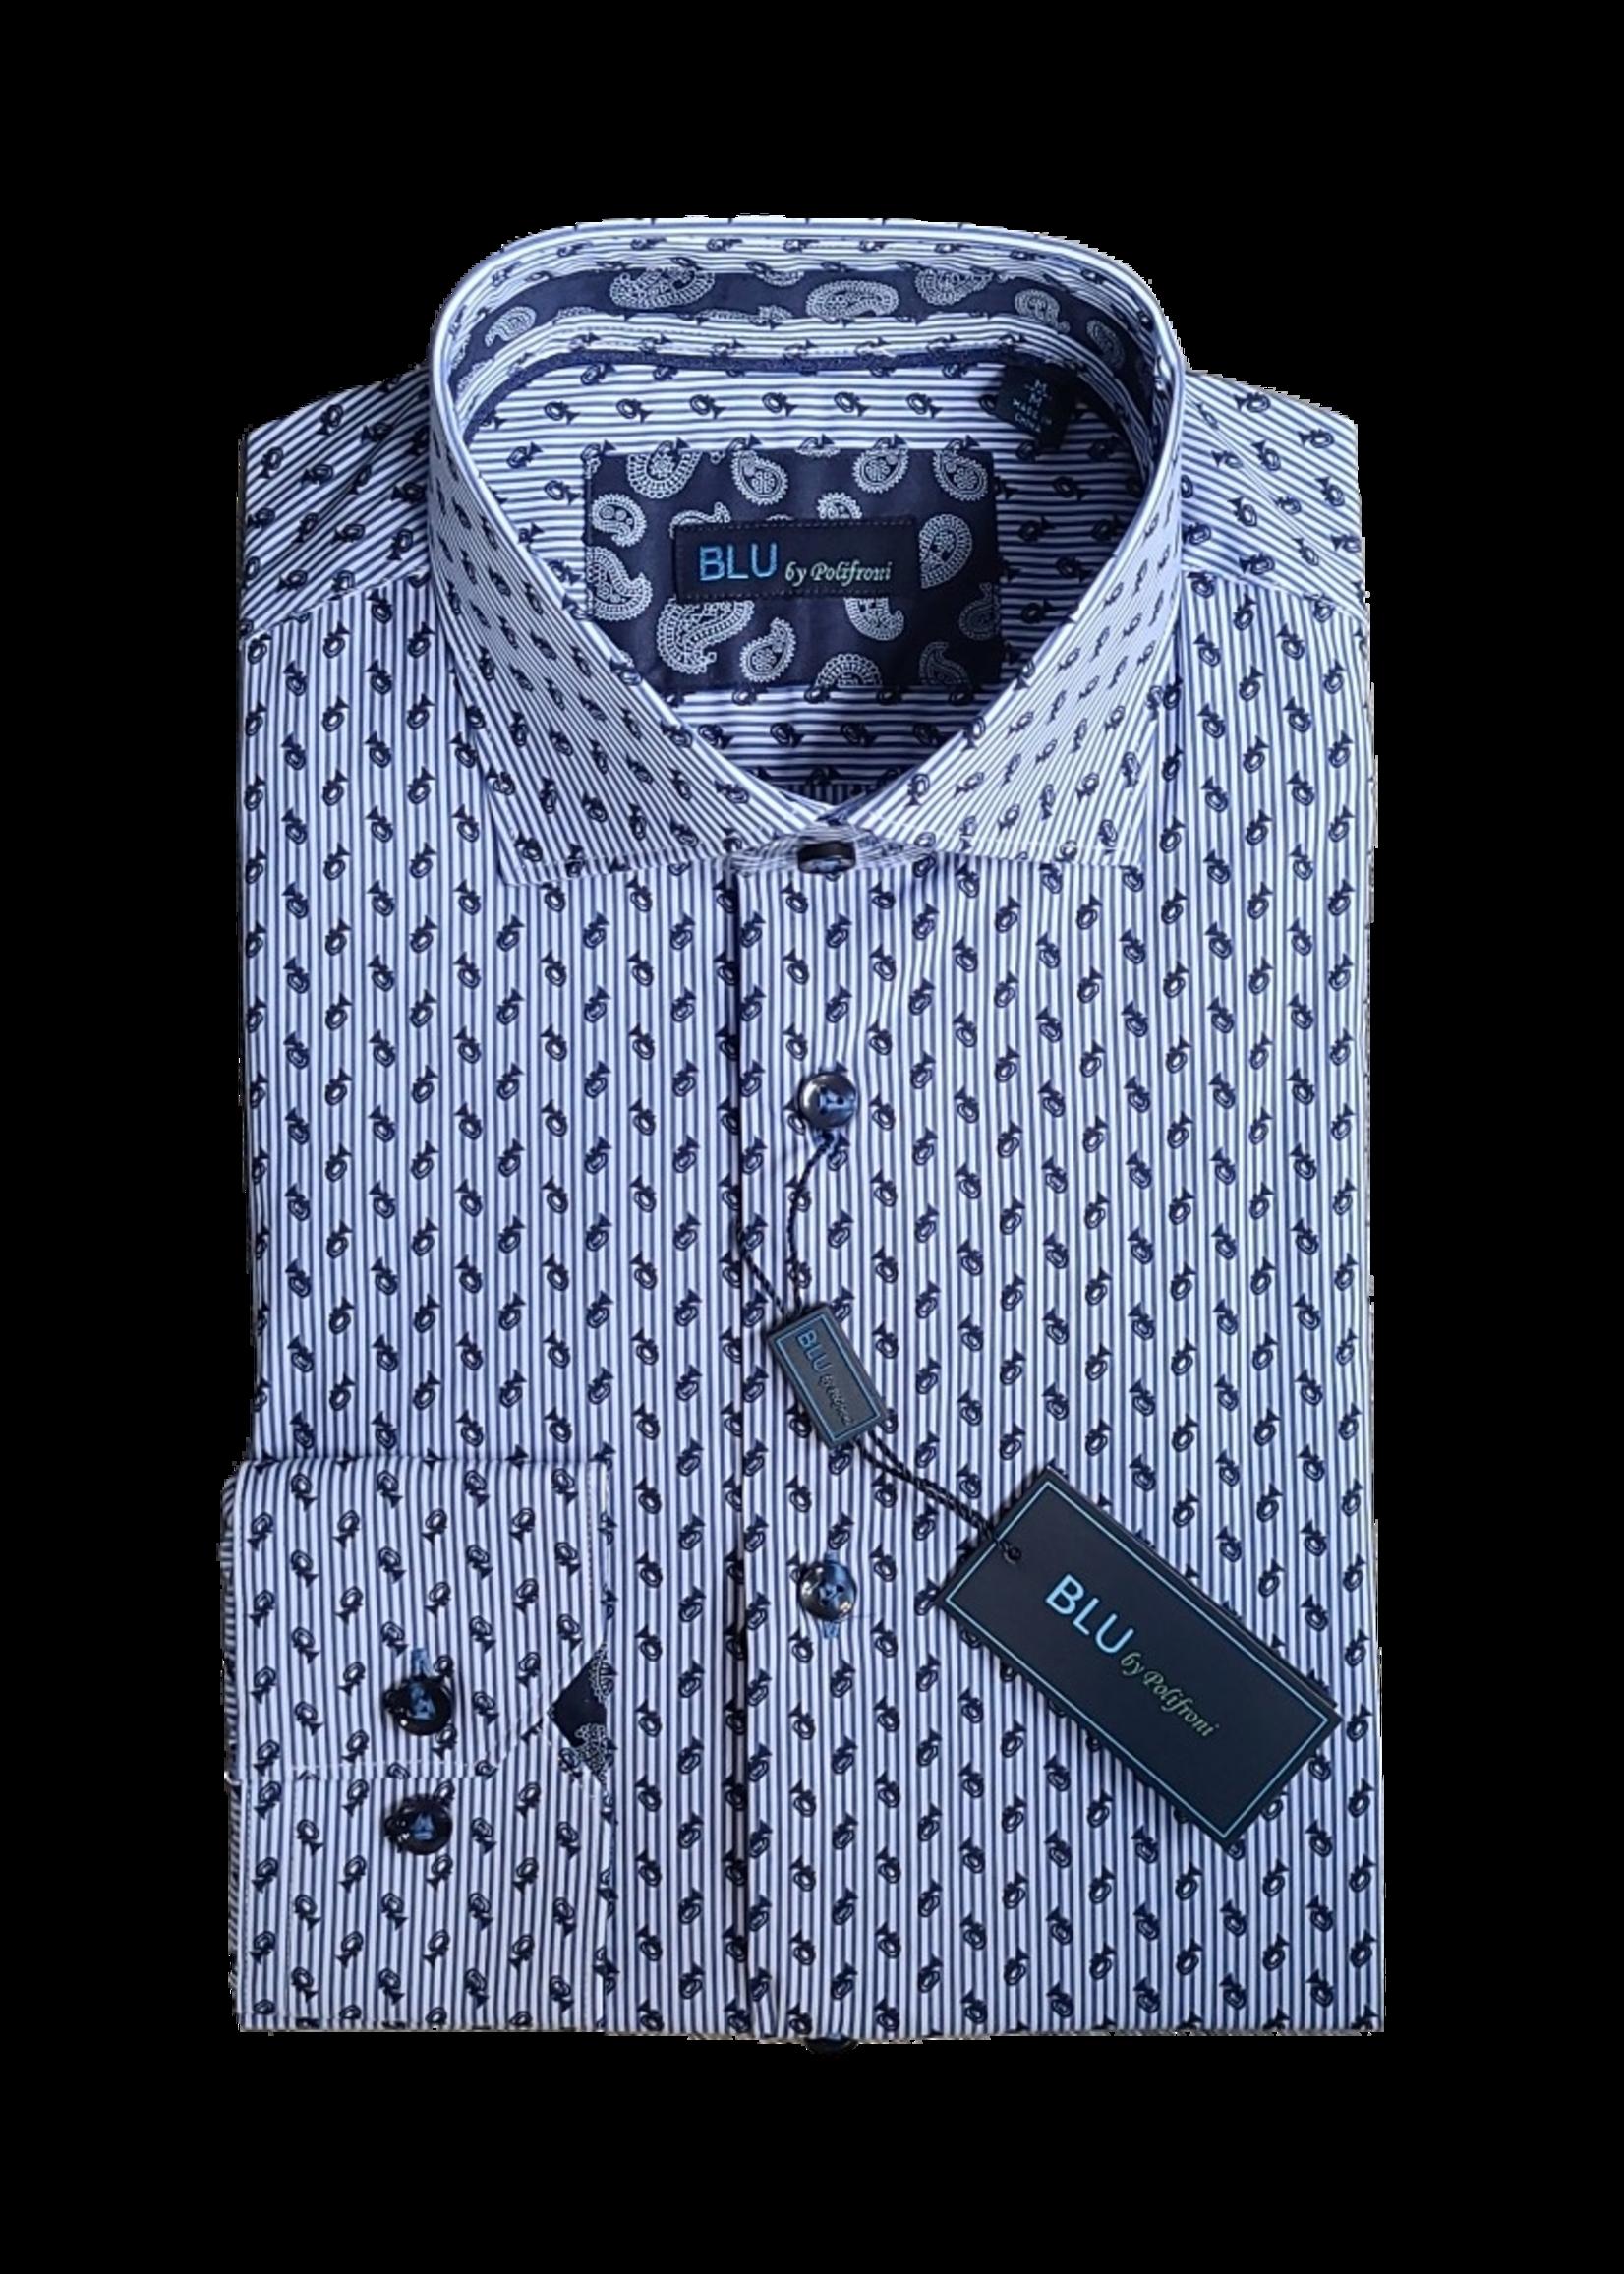 Blu Polifroni BLU B2149522 Shirt